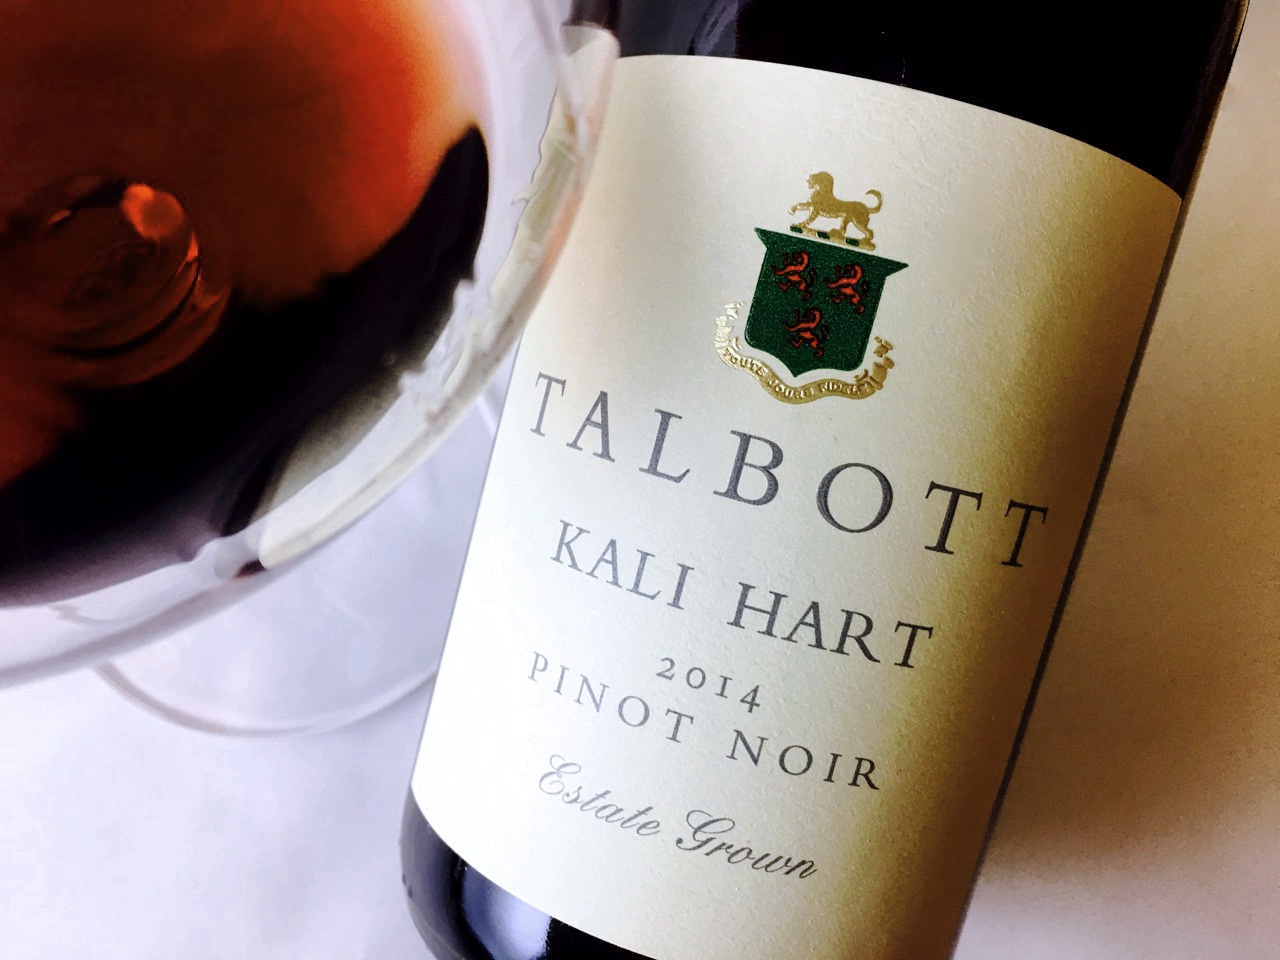 2014 Talbott Pinot Noir Kali Hart Monterey